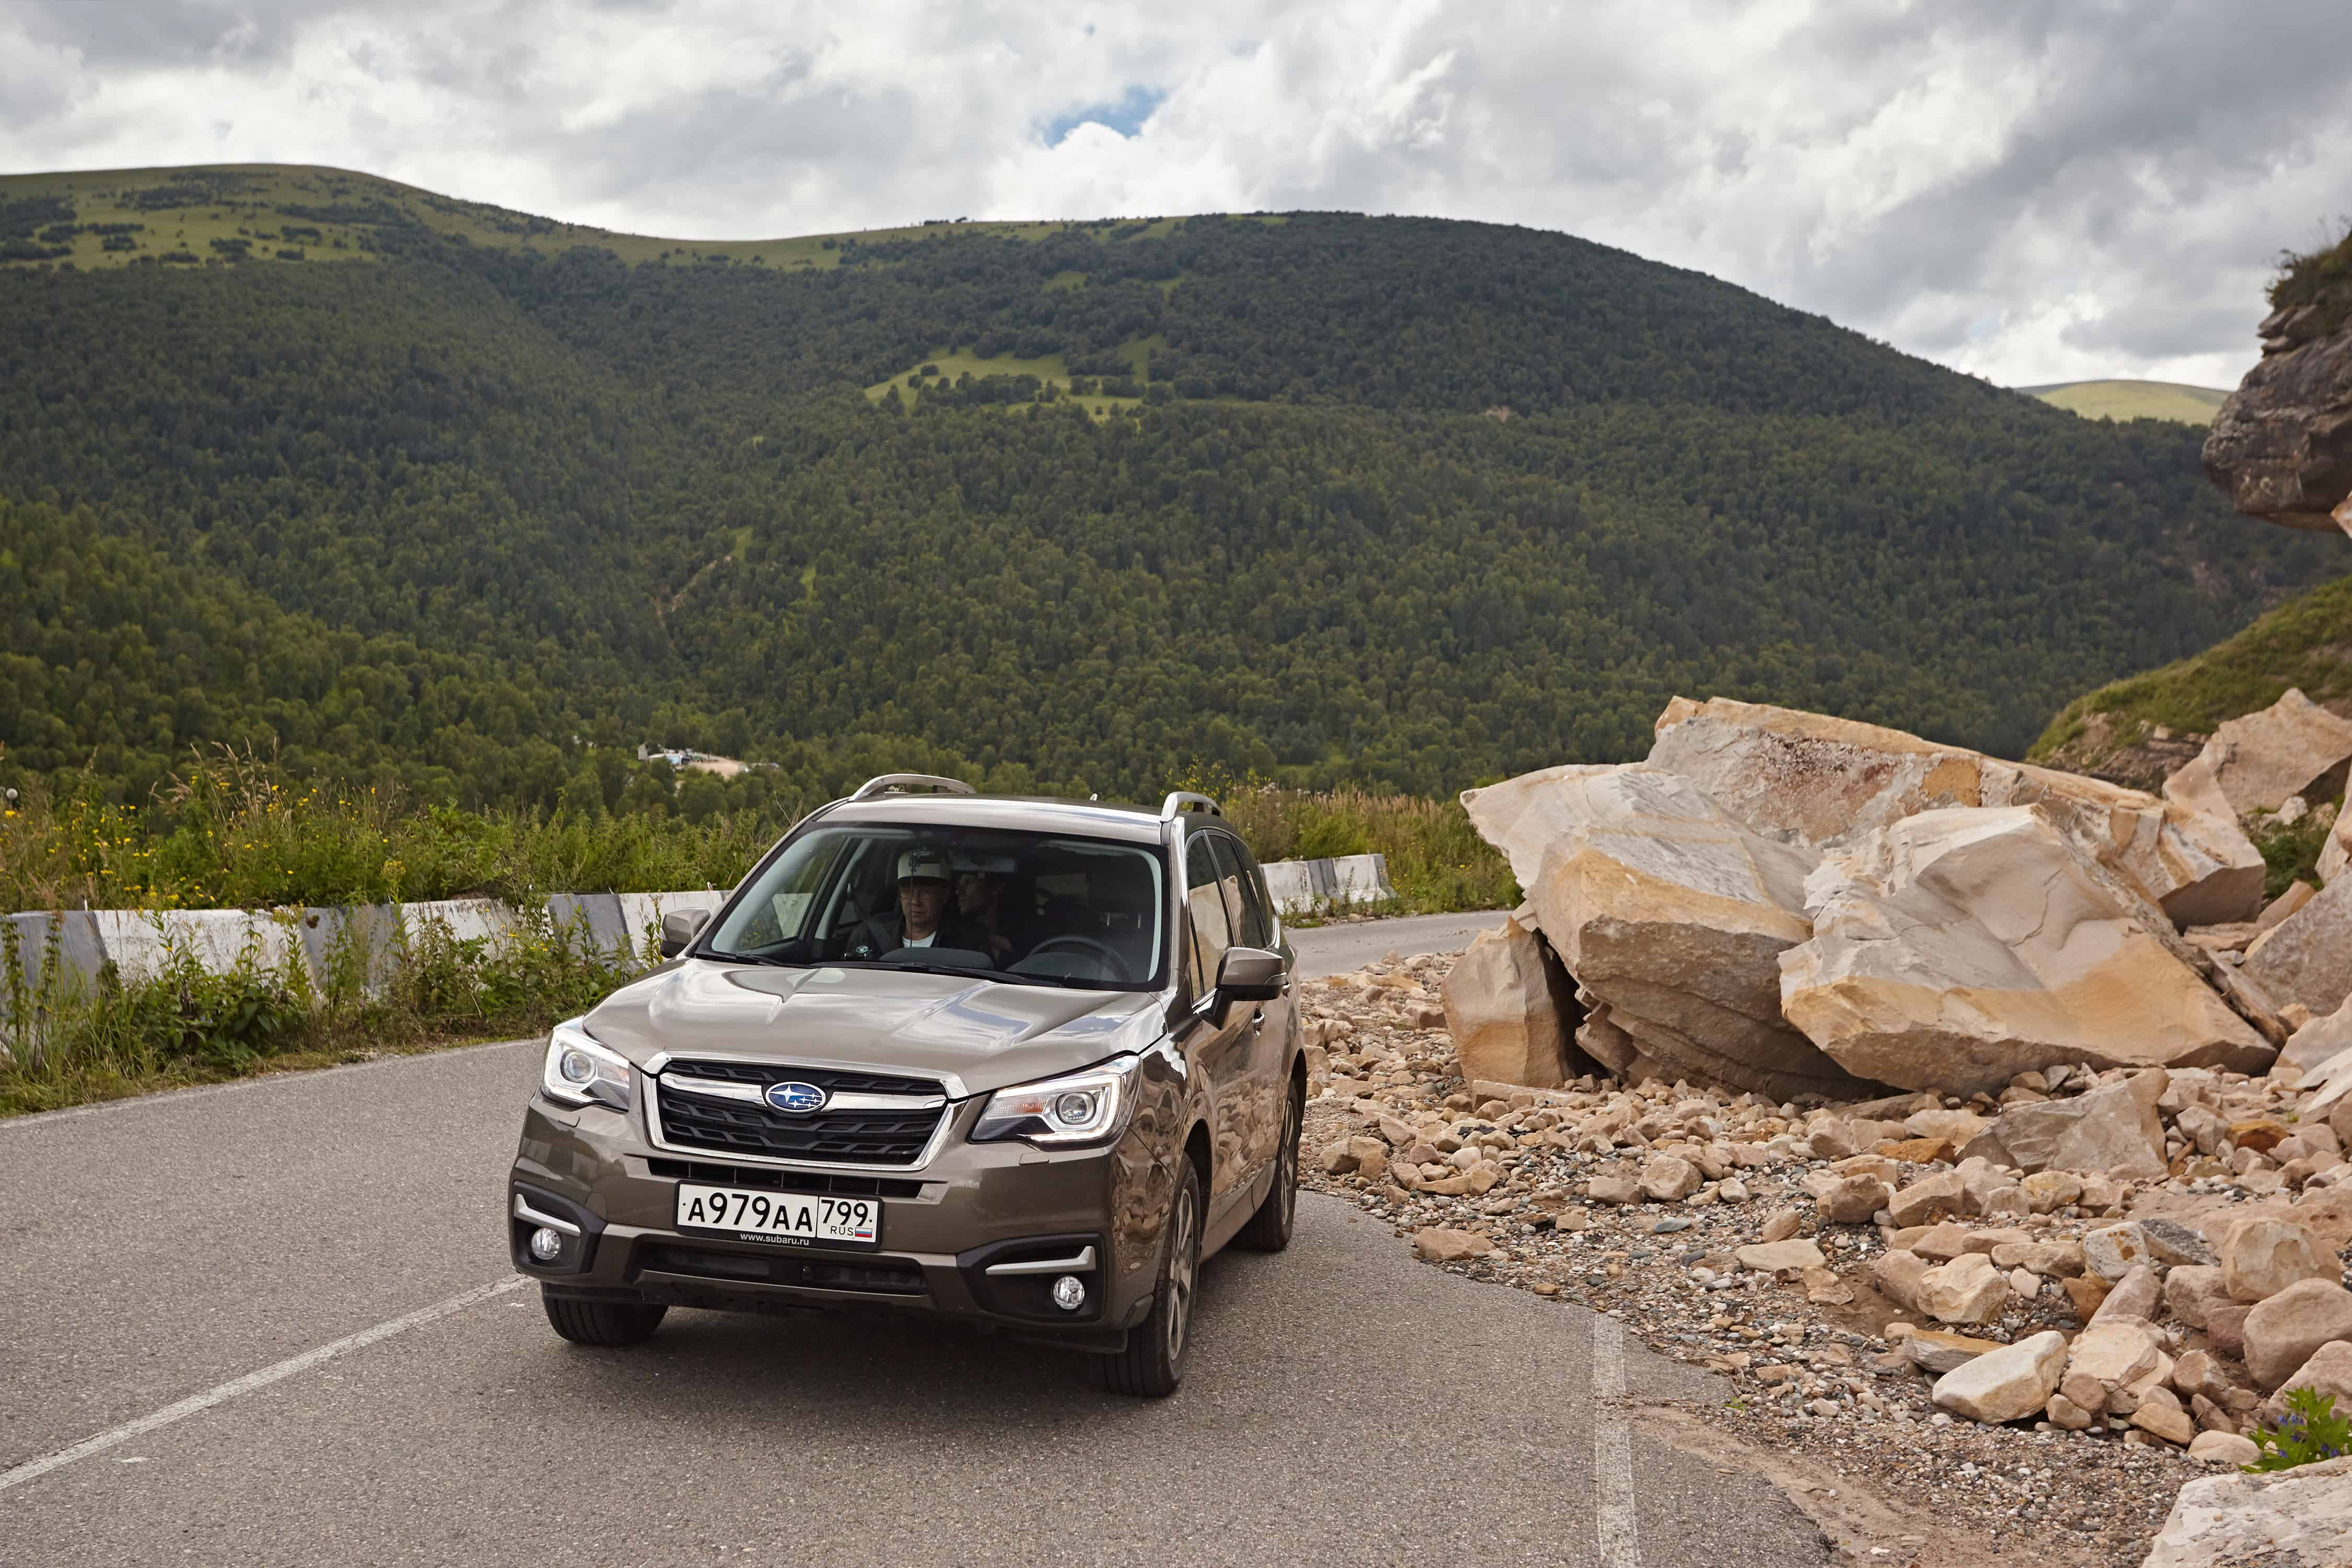 Subaru Recalling 10,417 Vehicles Because of Power Steering Problem